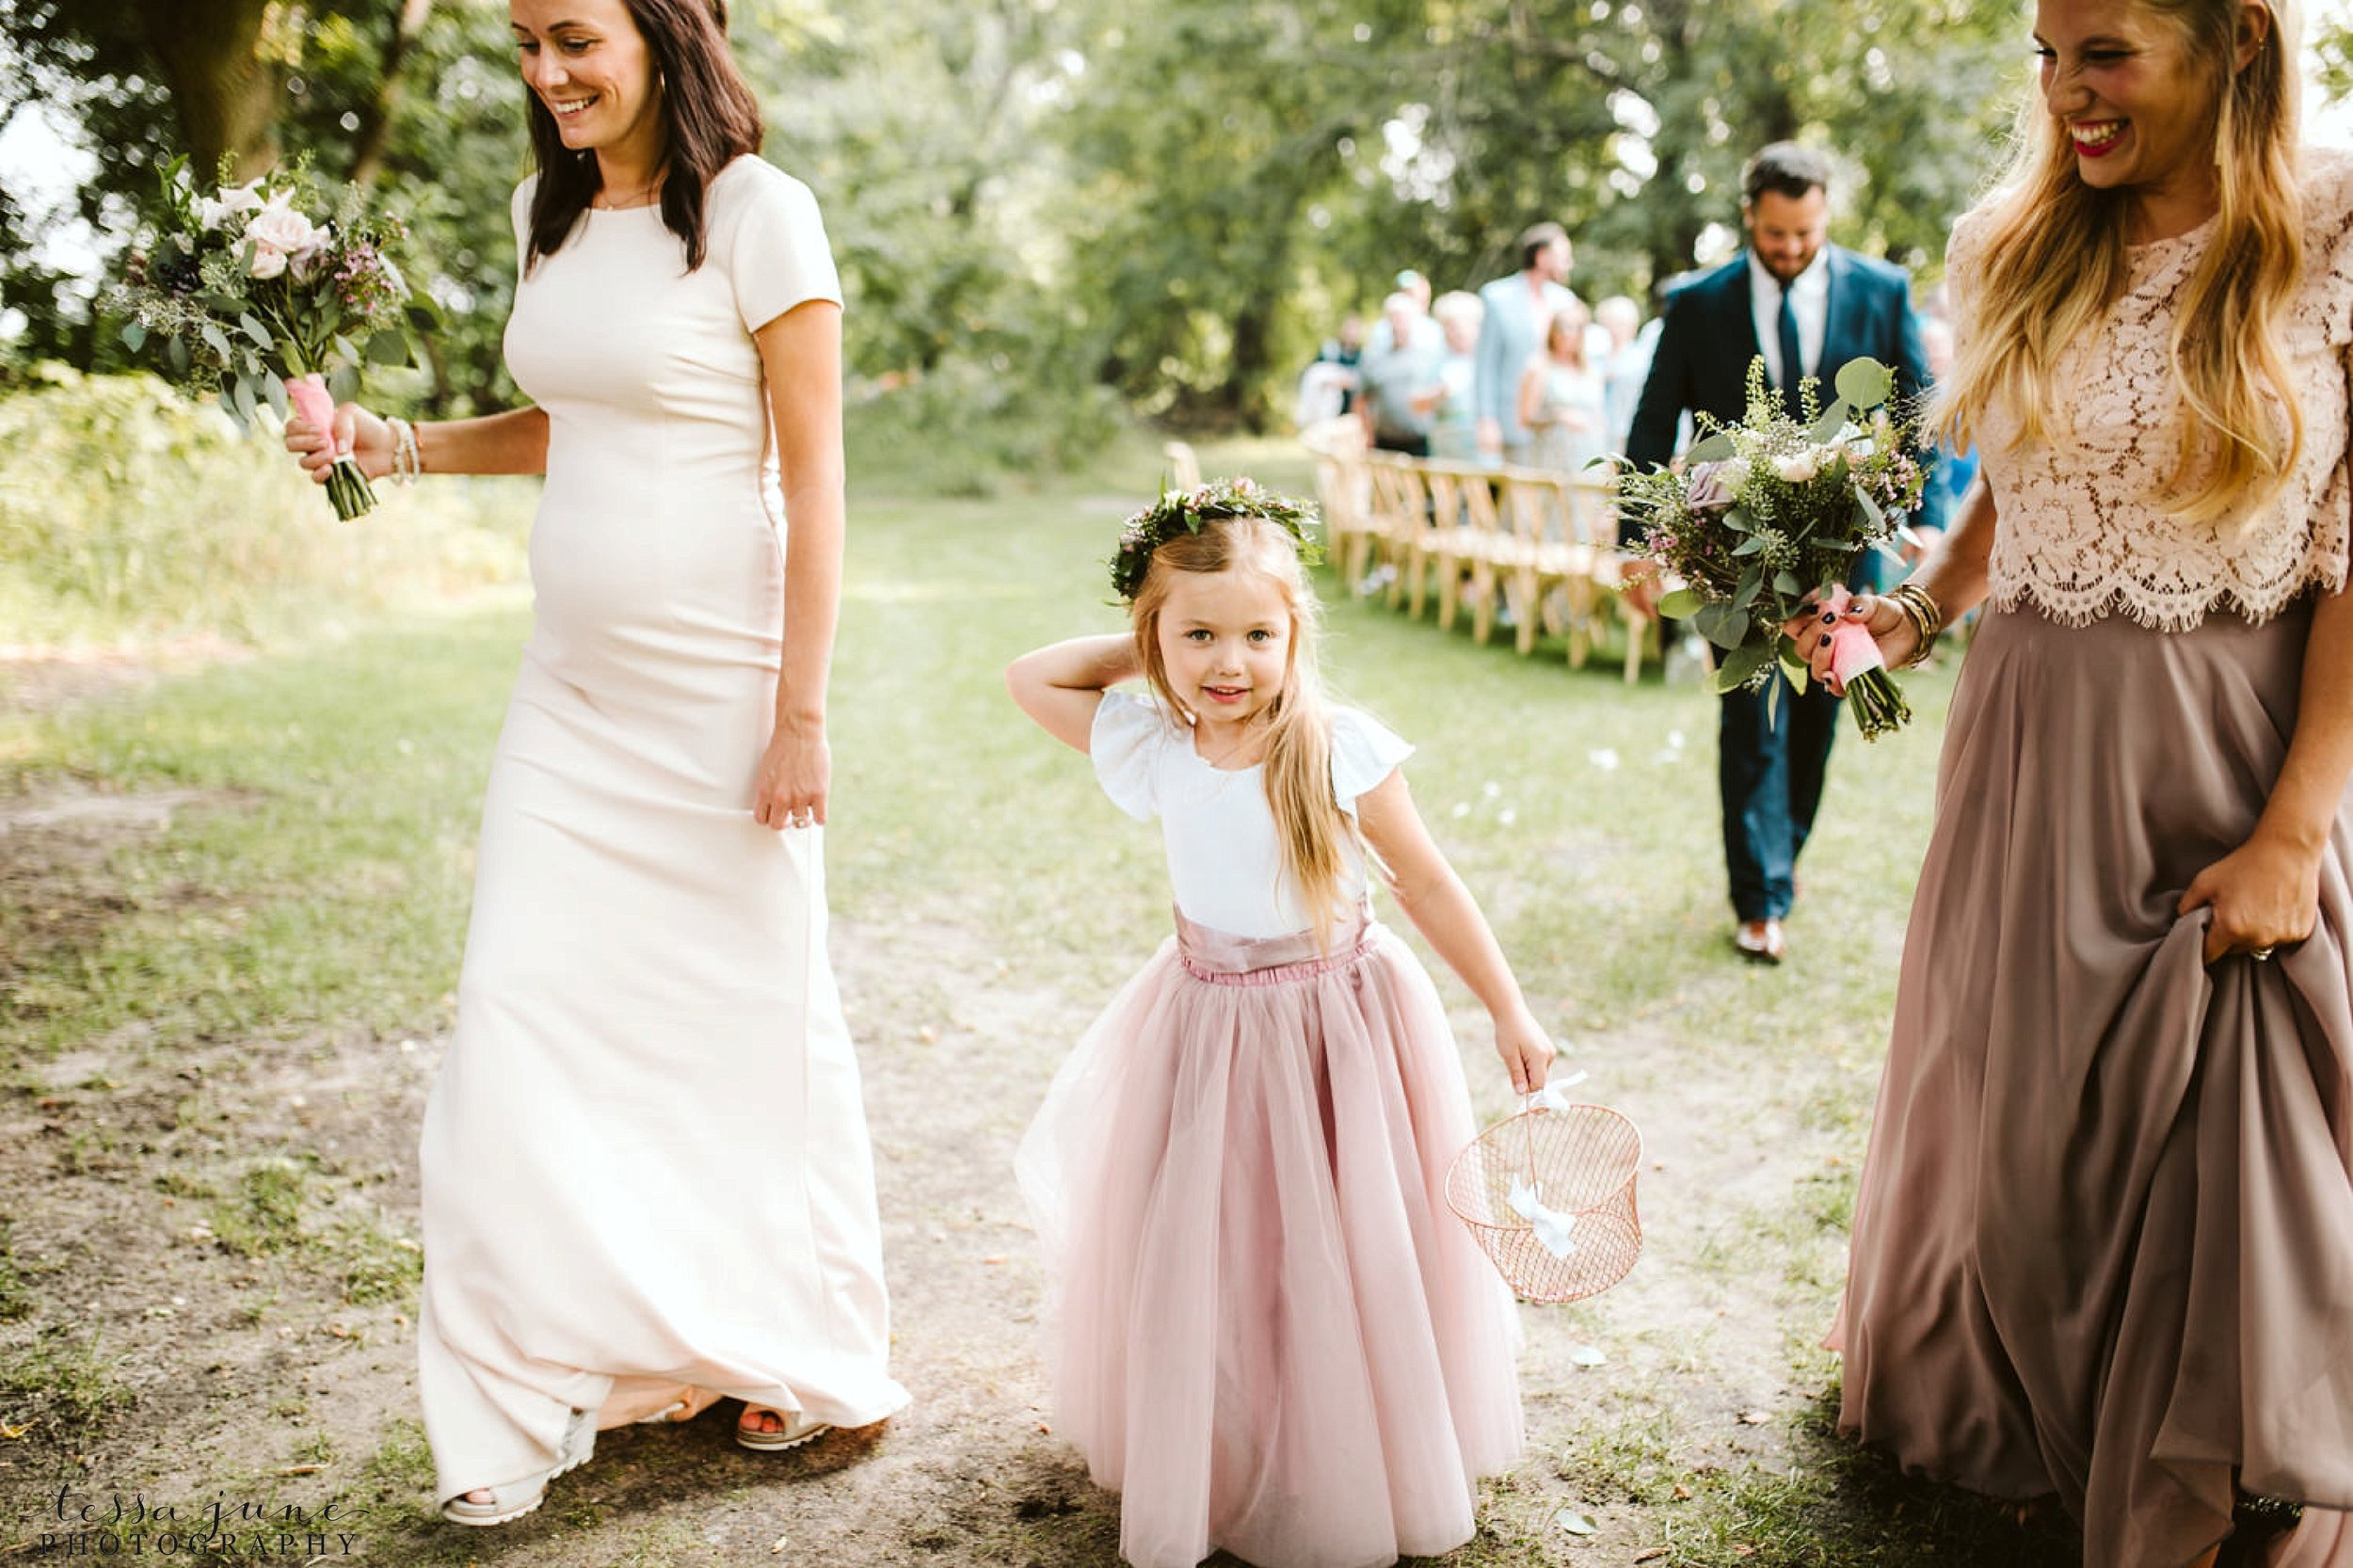 gathered-oaks-barn-wedding-alexandria-minnesota-76.jpg